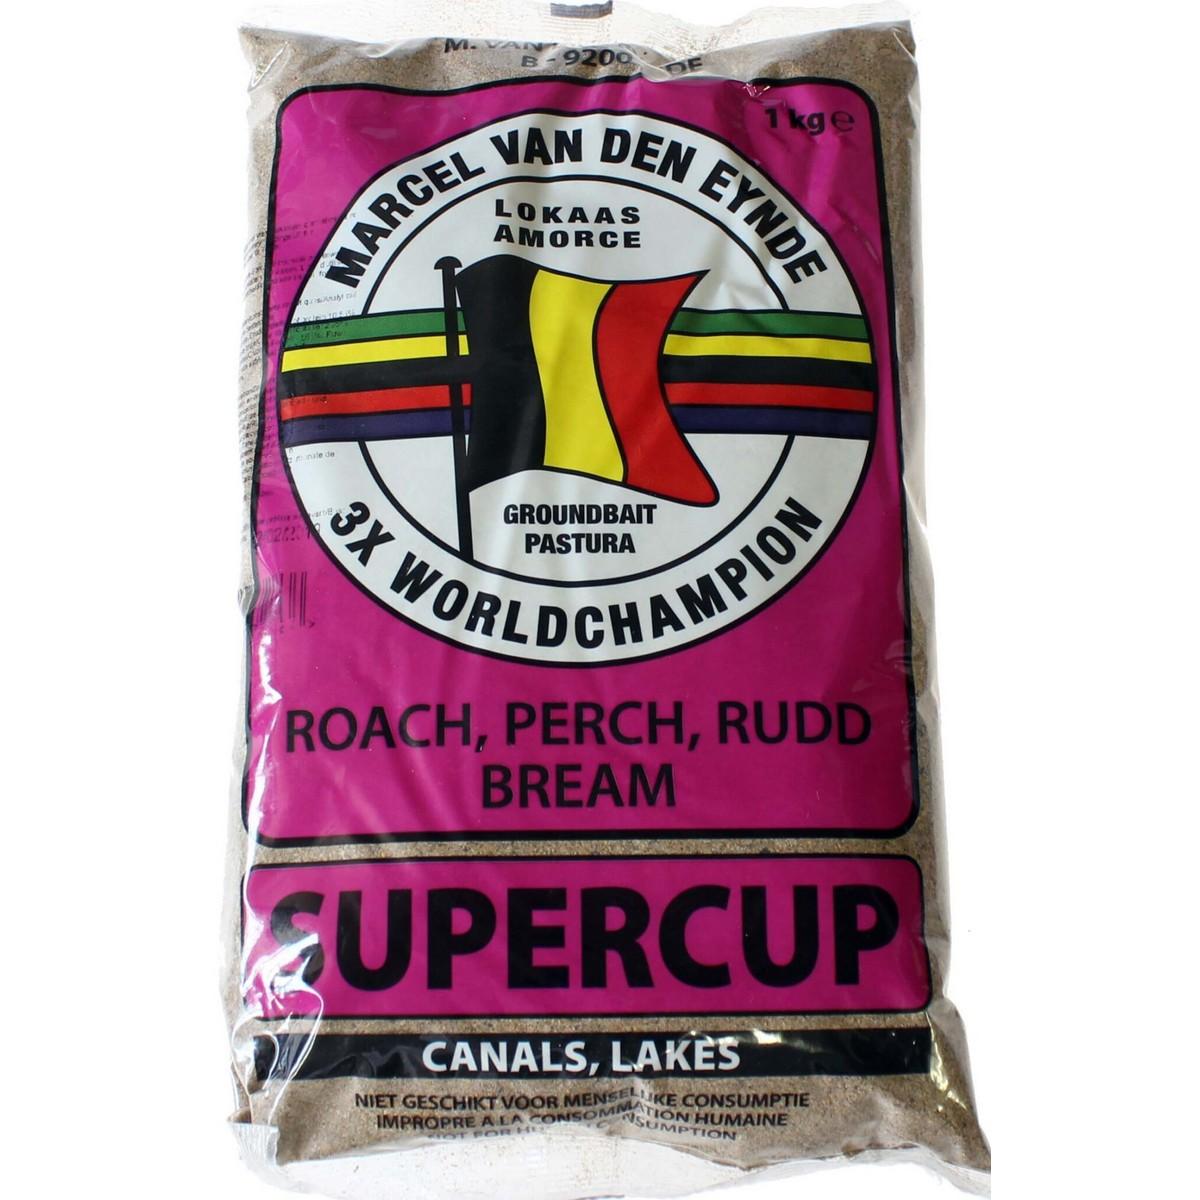 Захранка за риболов Supercup 1kg - Van Den Eynde